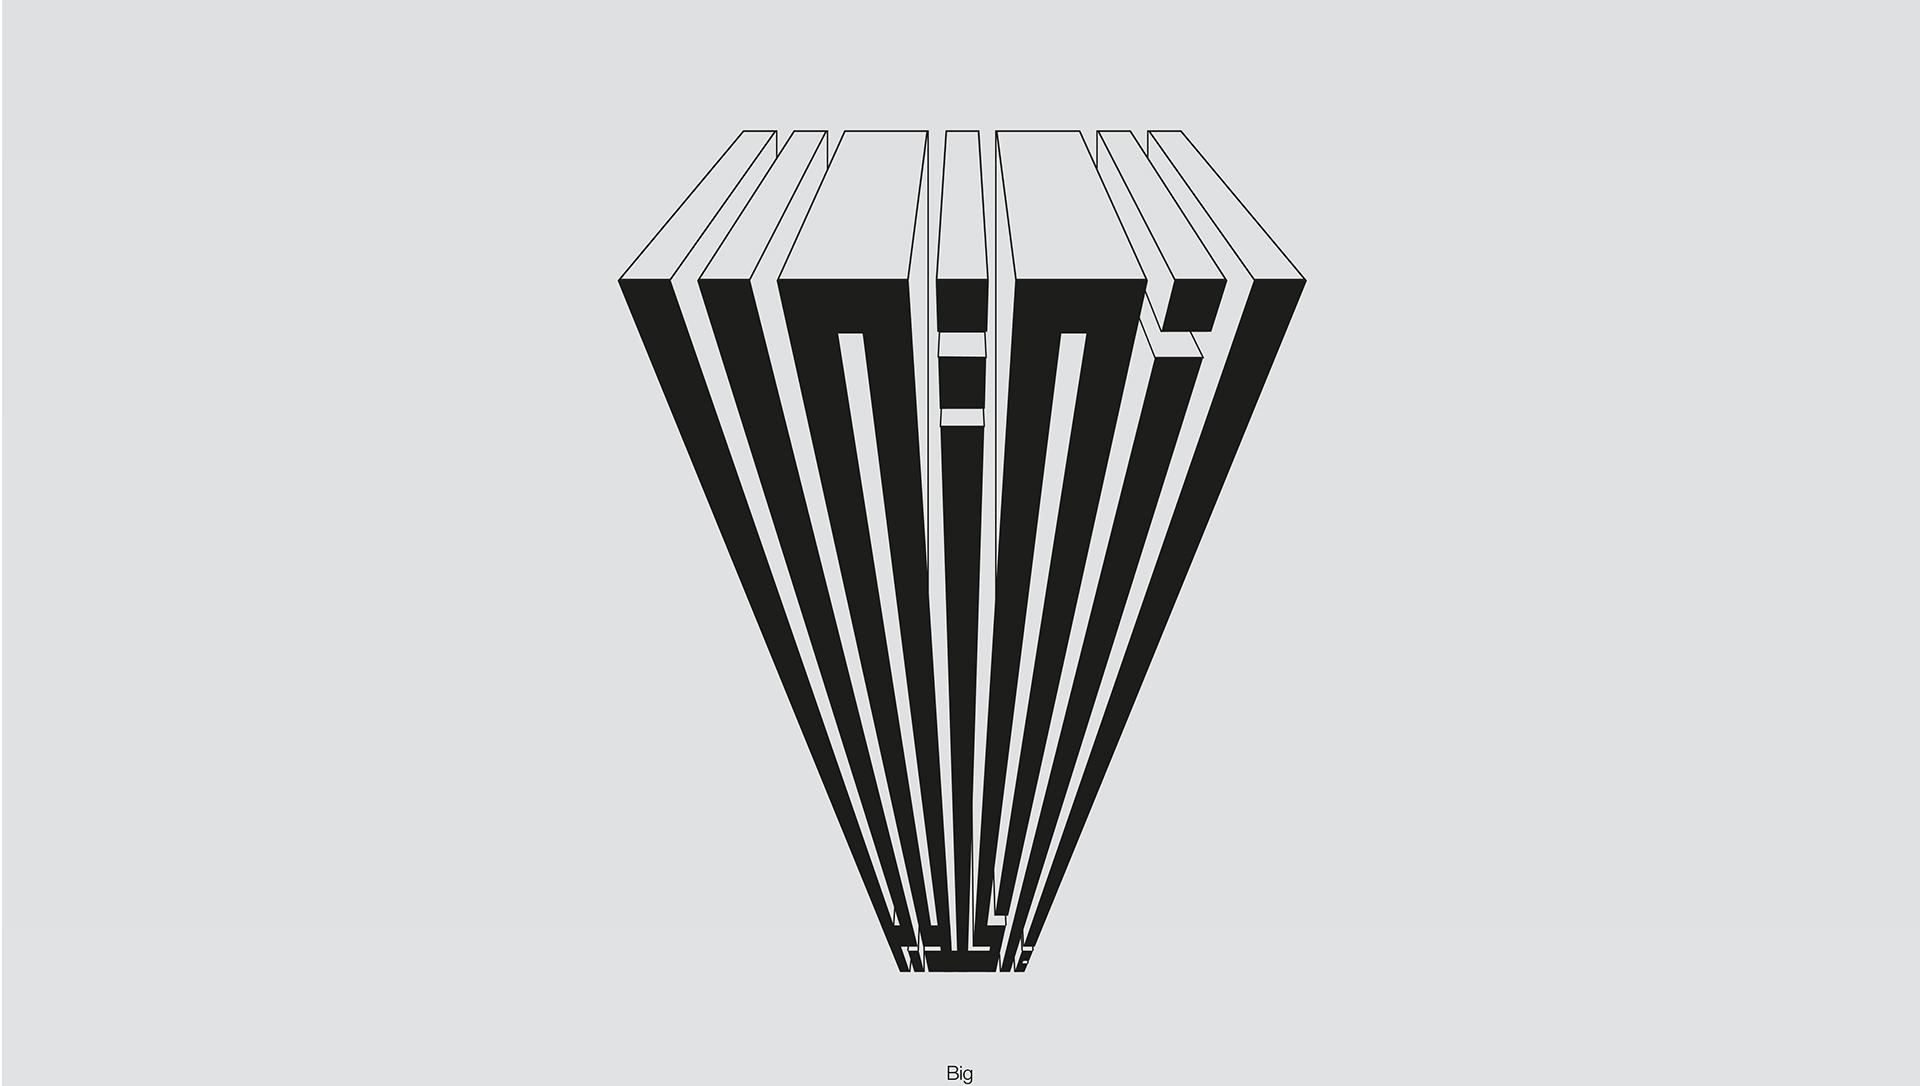 Typography: Inktober Challenge in Expressive Kufic